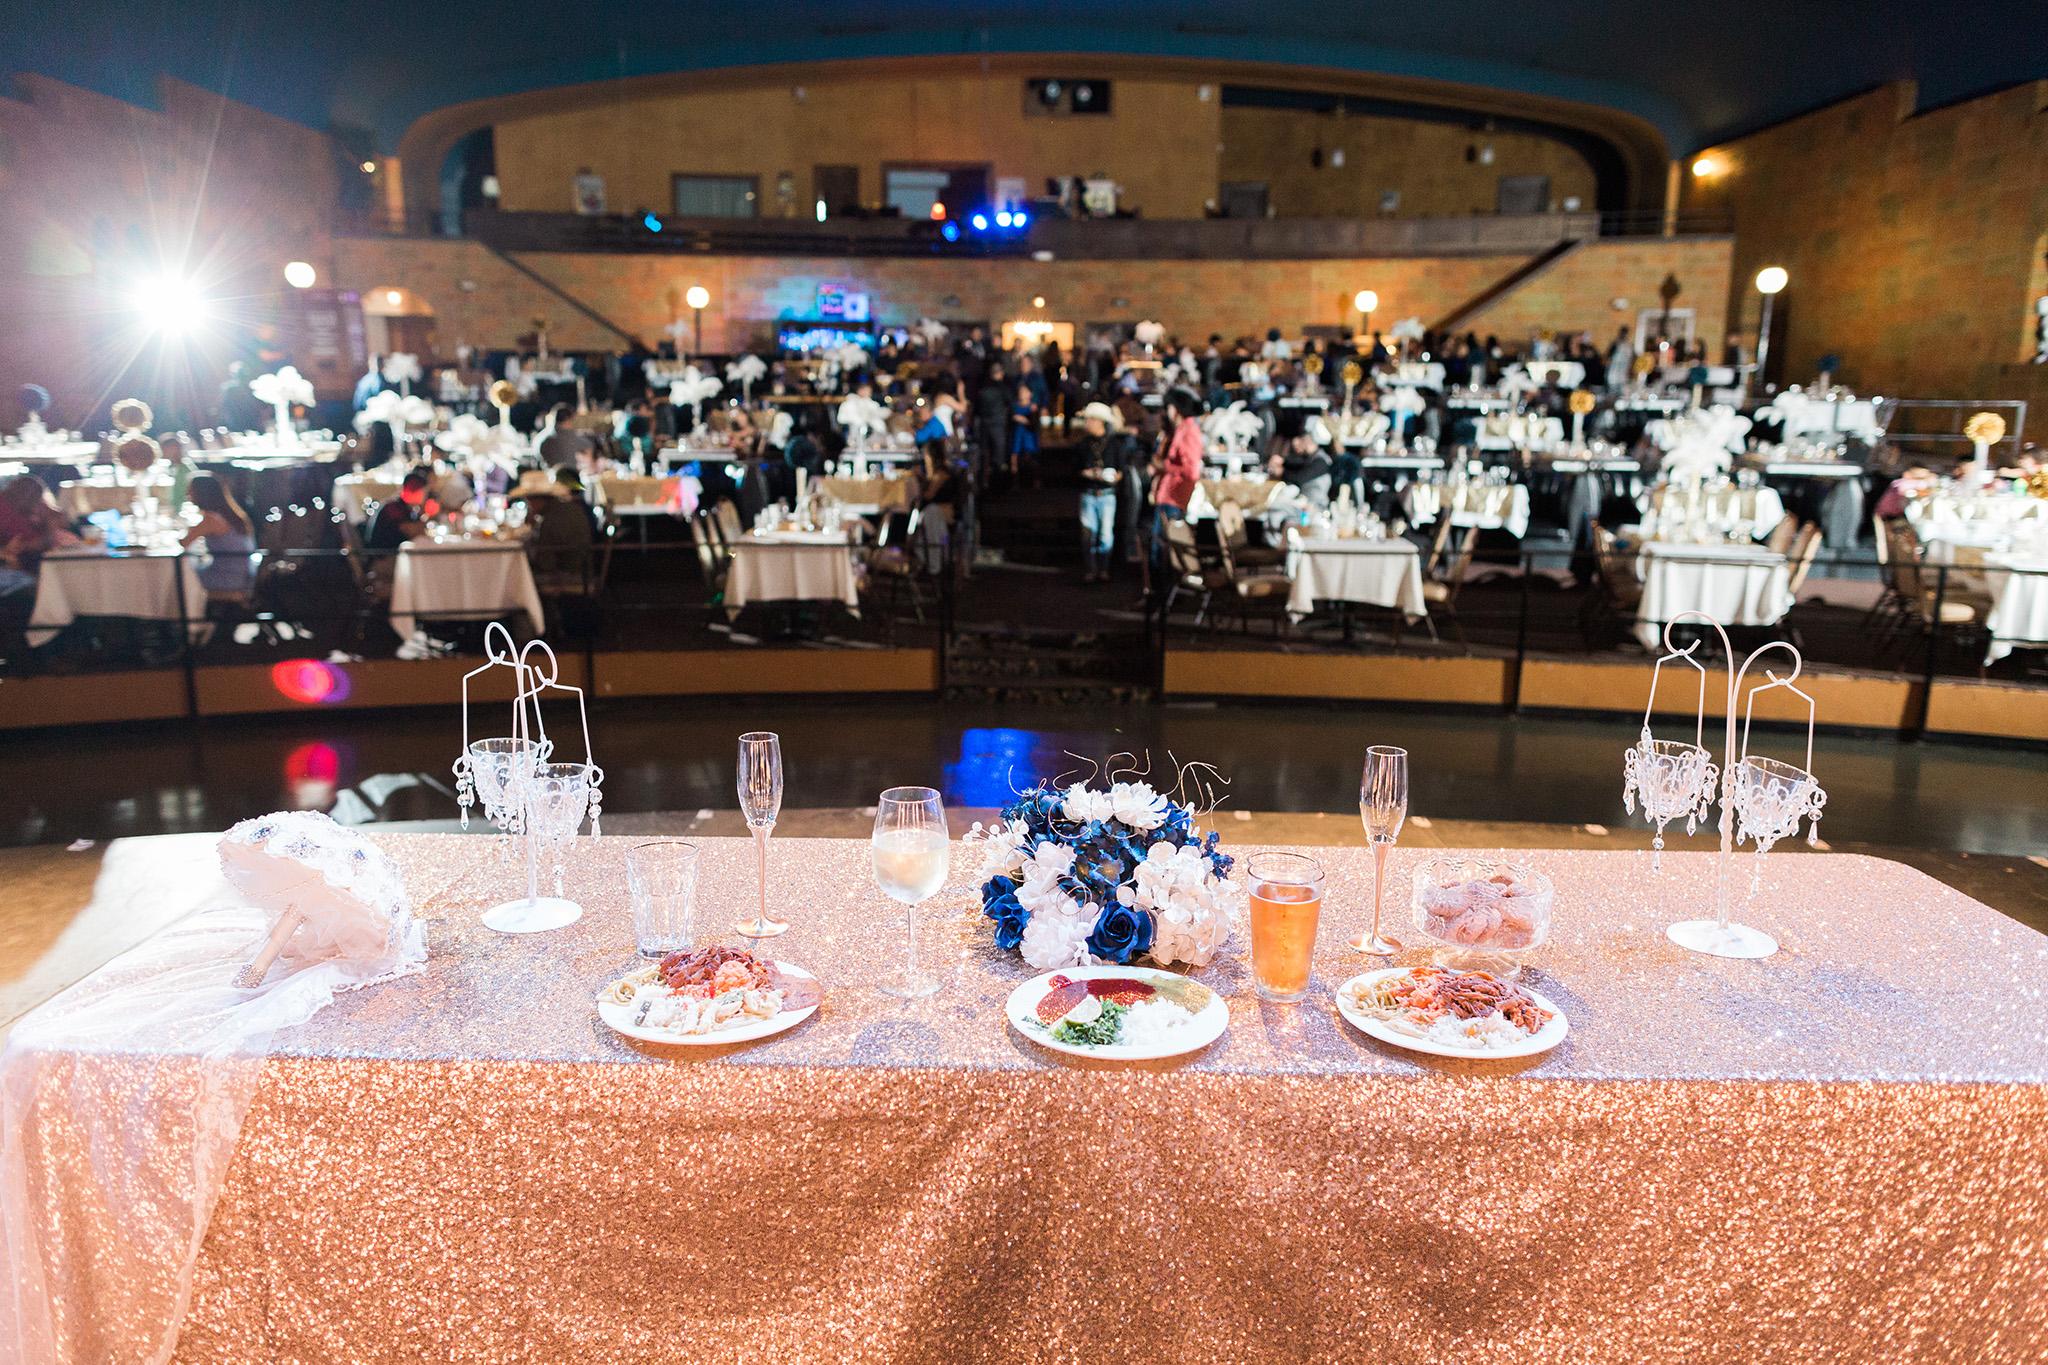 Wedding Reception Venues In Wichita Ks Wichita Wedding